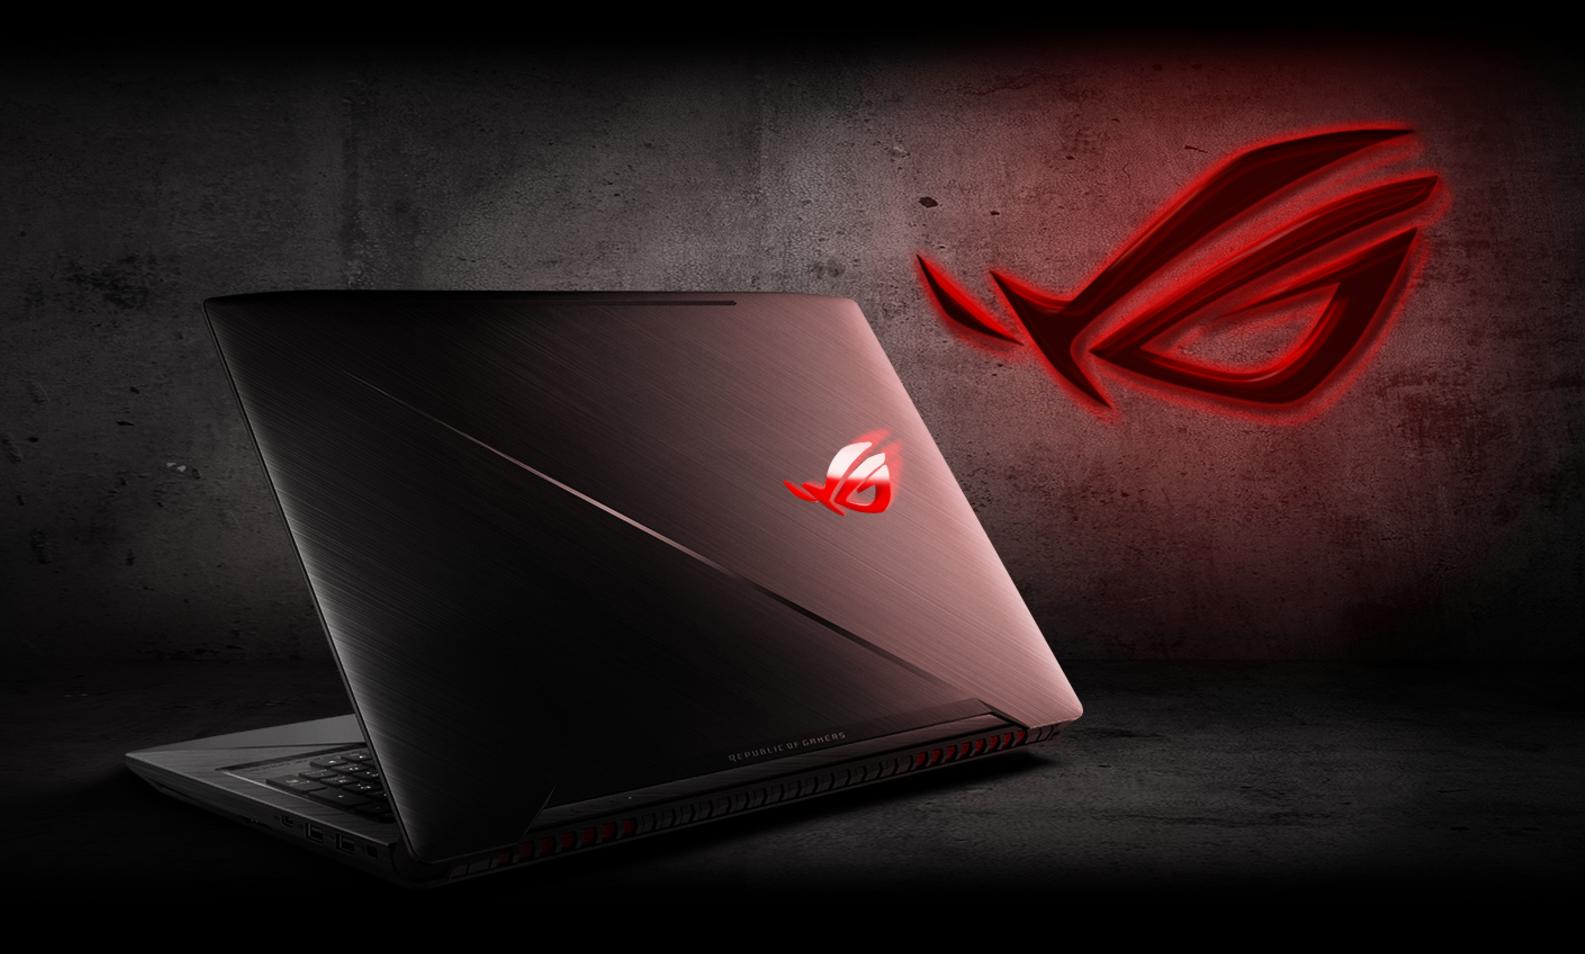 ASUS ROG STRIX GL503VD DB71 156 Full HD Gaming Laptop W